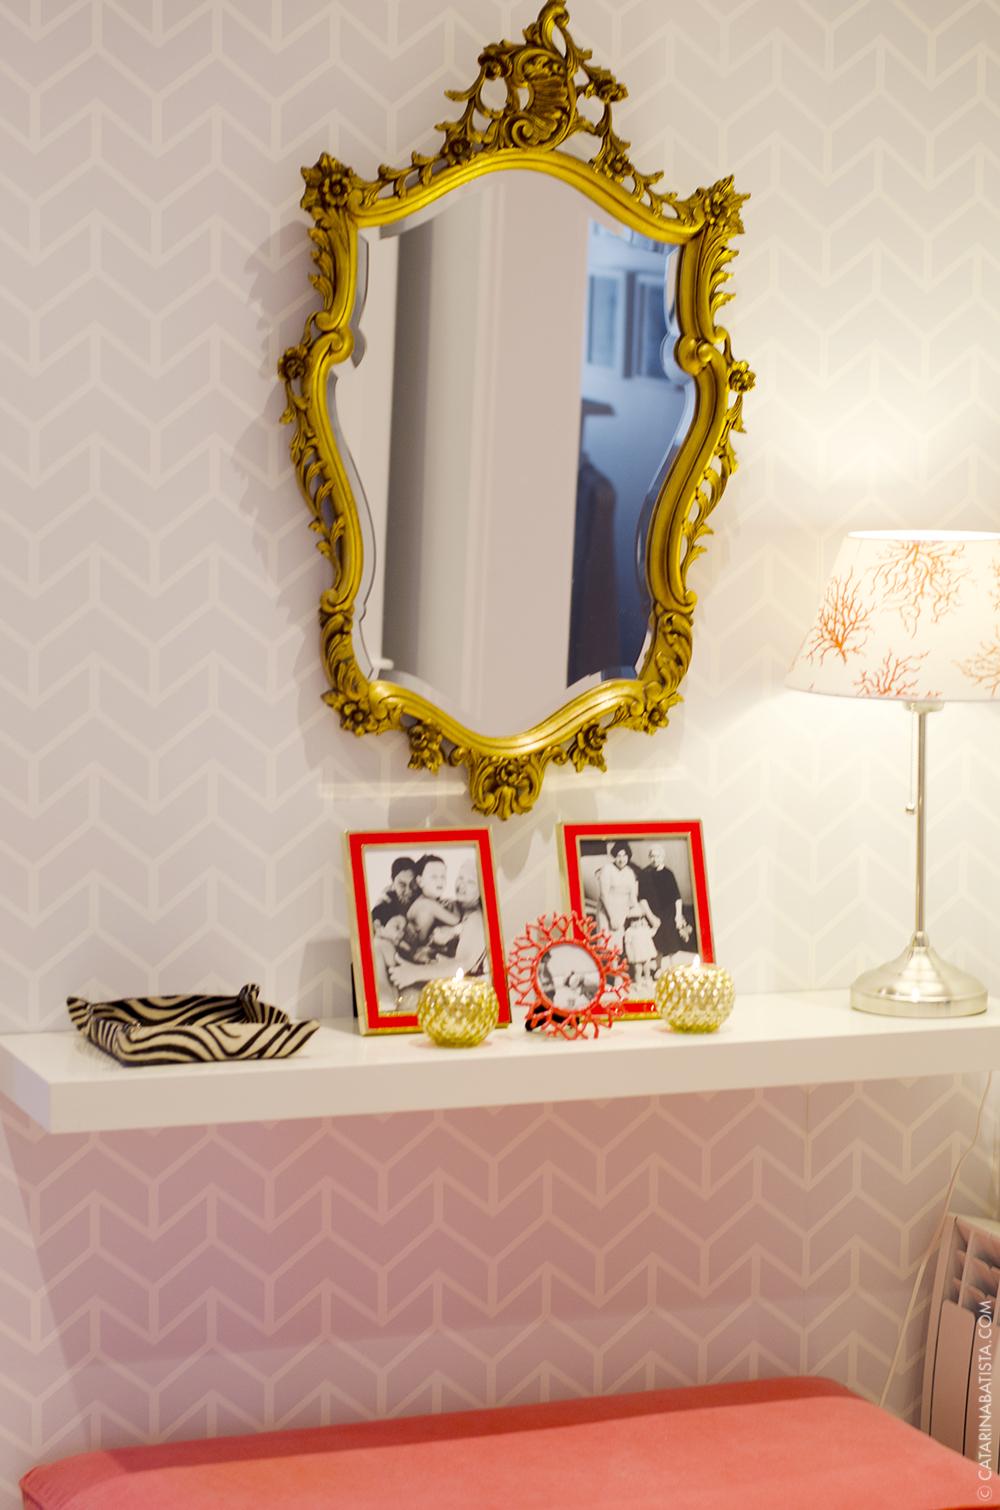 27-catarina-batista-arquitectura-design-interior-decoracao--apartamento-quarto-bedroom-livingroom-sala.jpg